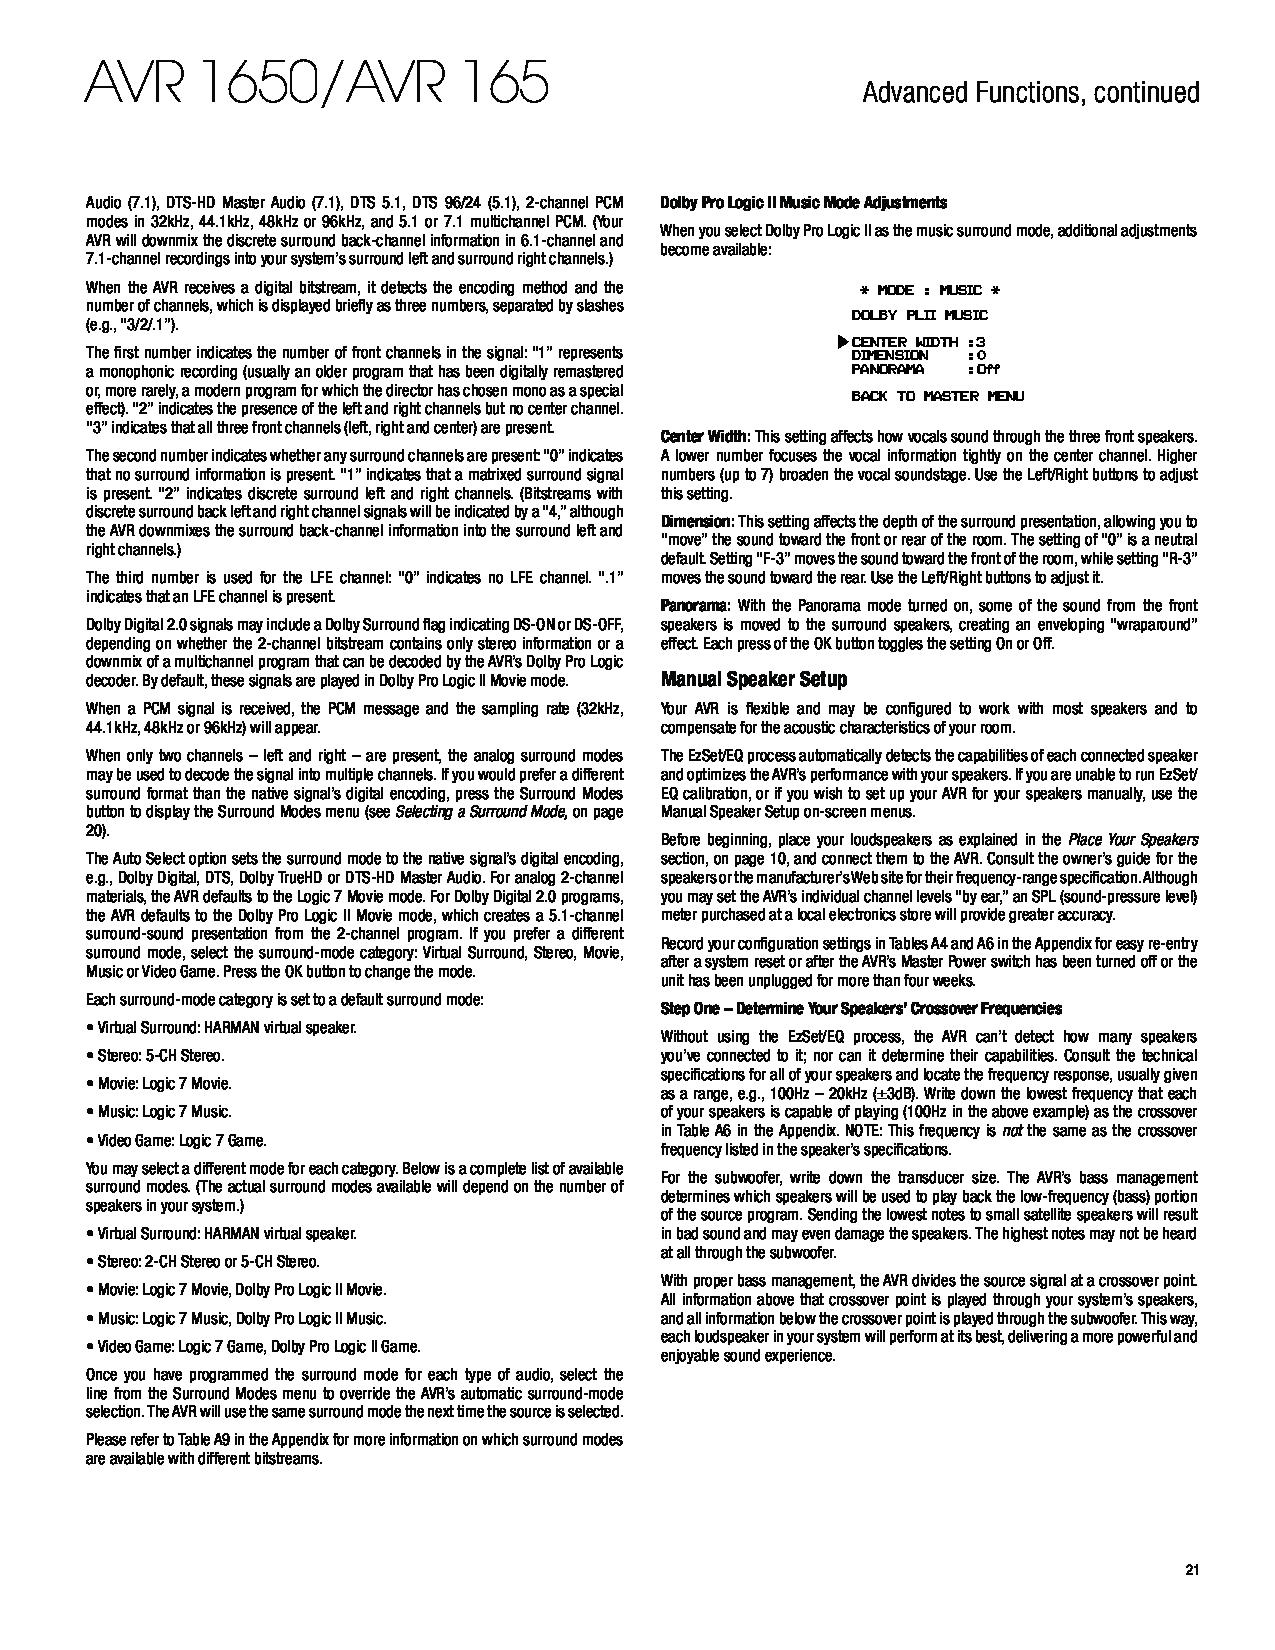 harman kardon avr 151s manual